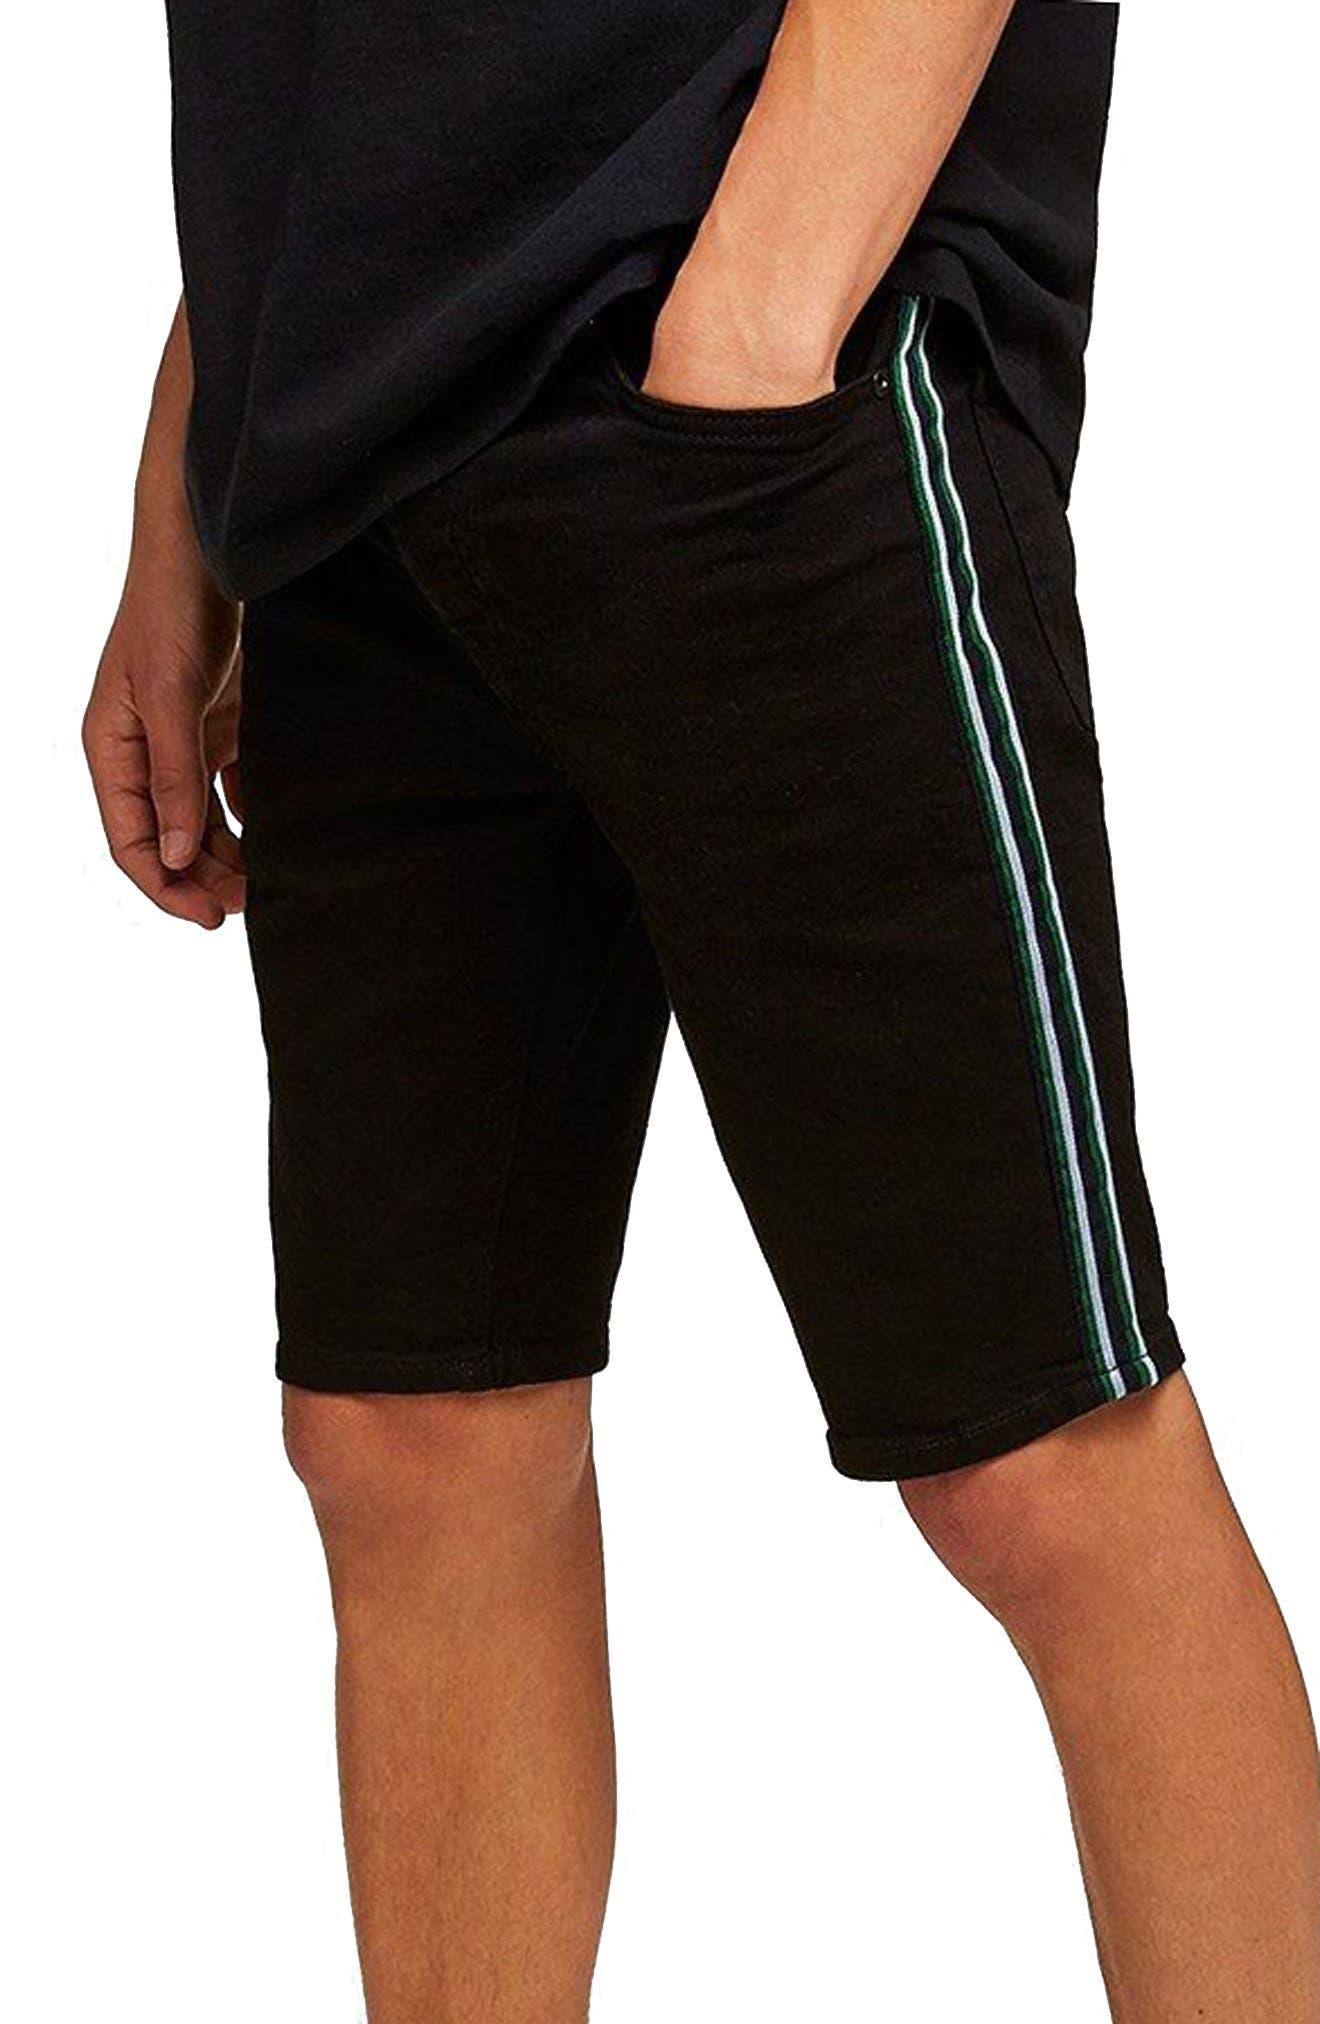 Tape Stretch Skinny Fit Denim Shorts,                             Main thumbnail 1, color,                             001